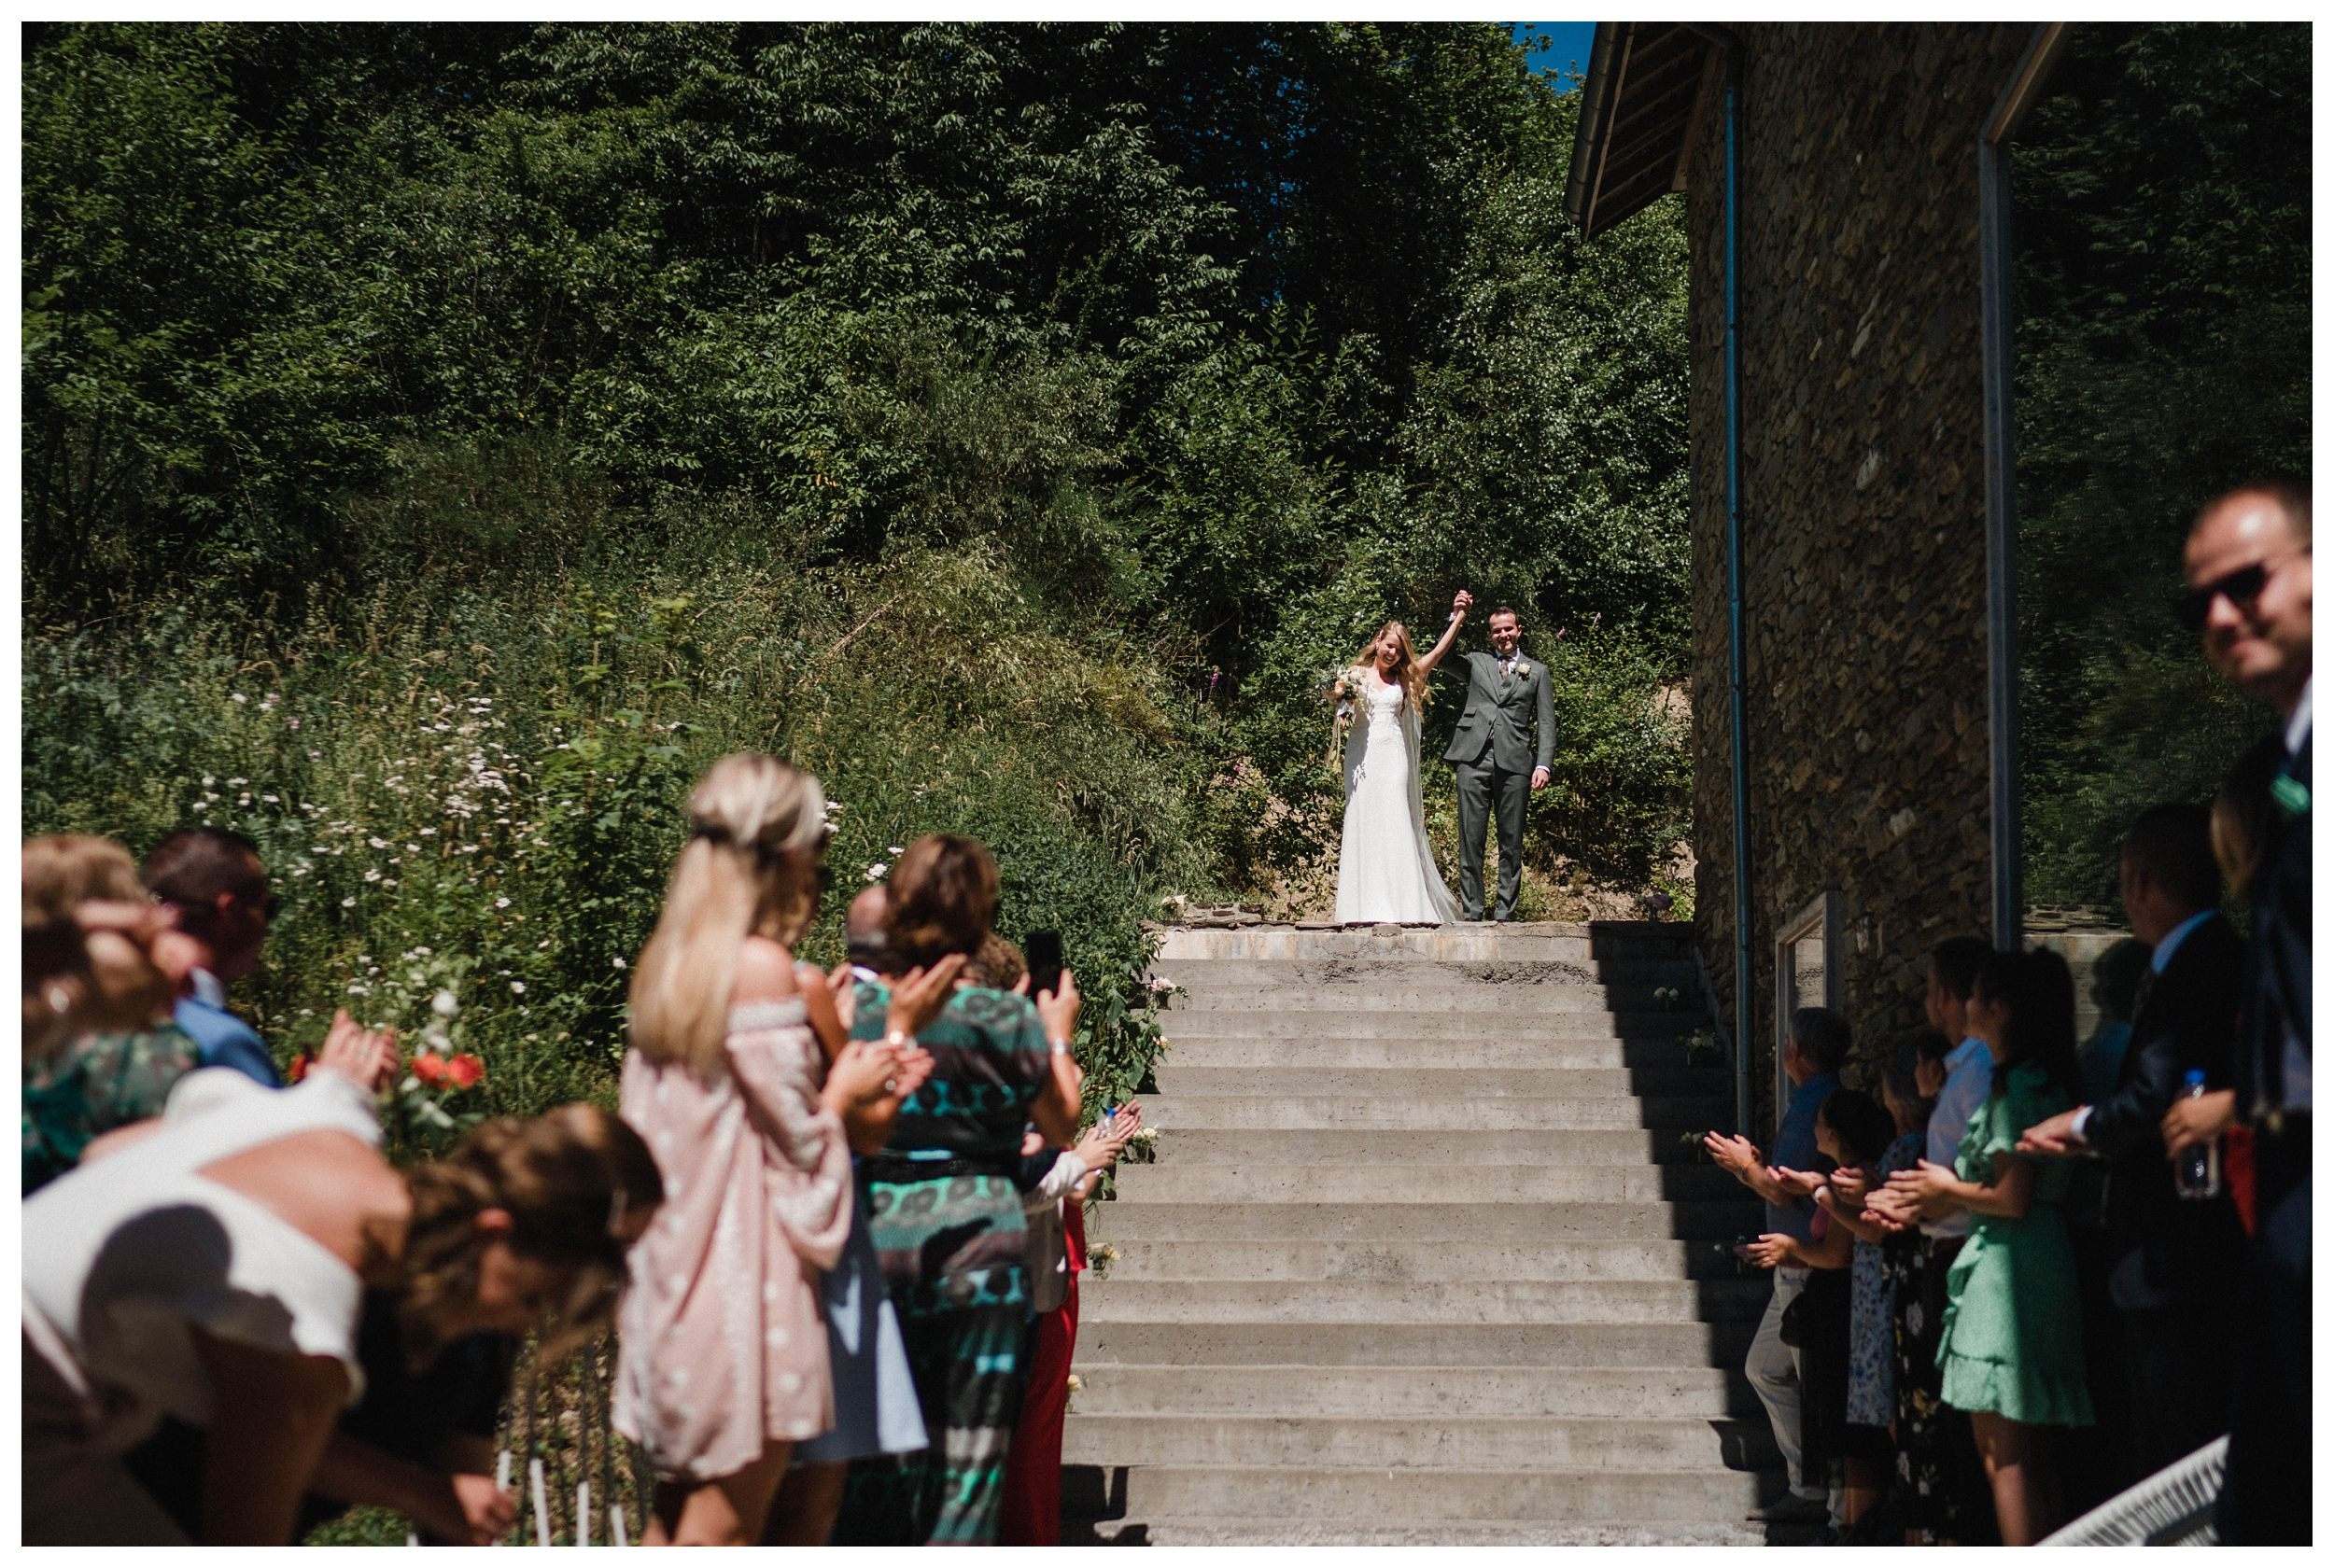 huwelijksfotograaf bruidsfotograaf destinationwedding huwelijksfotografie in ardennen nederland (59).jpg